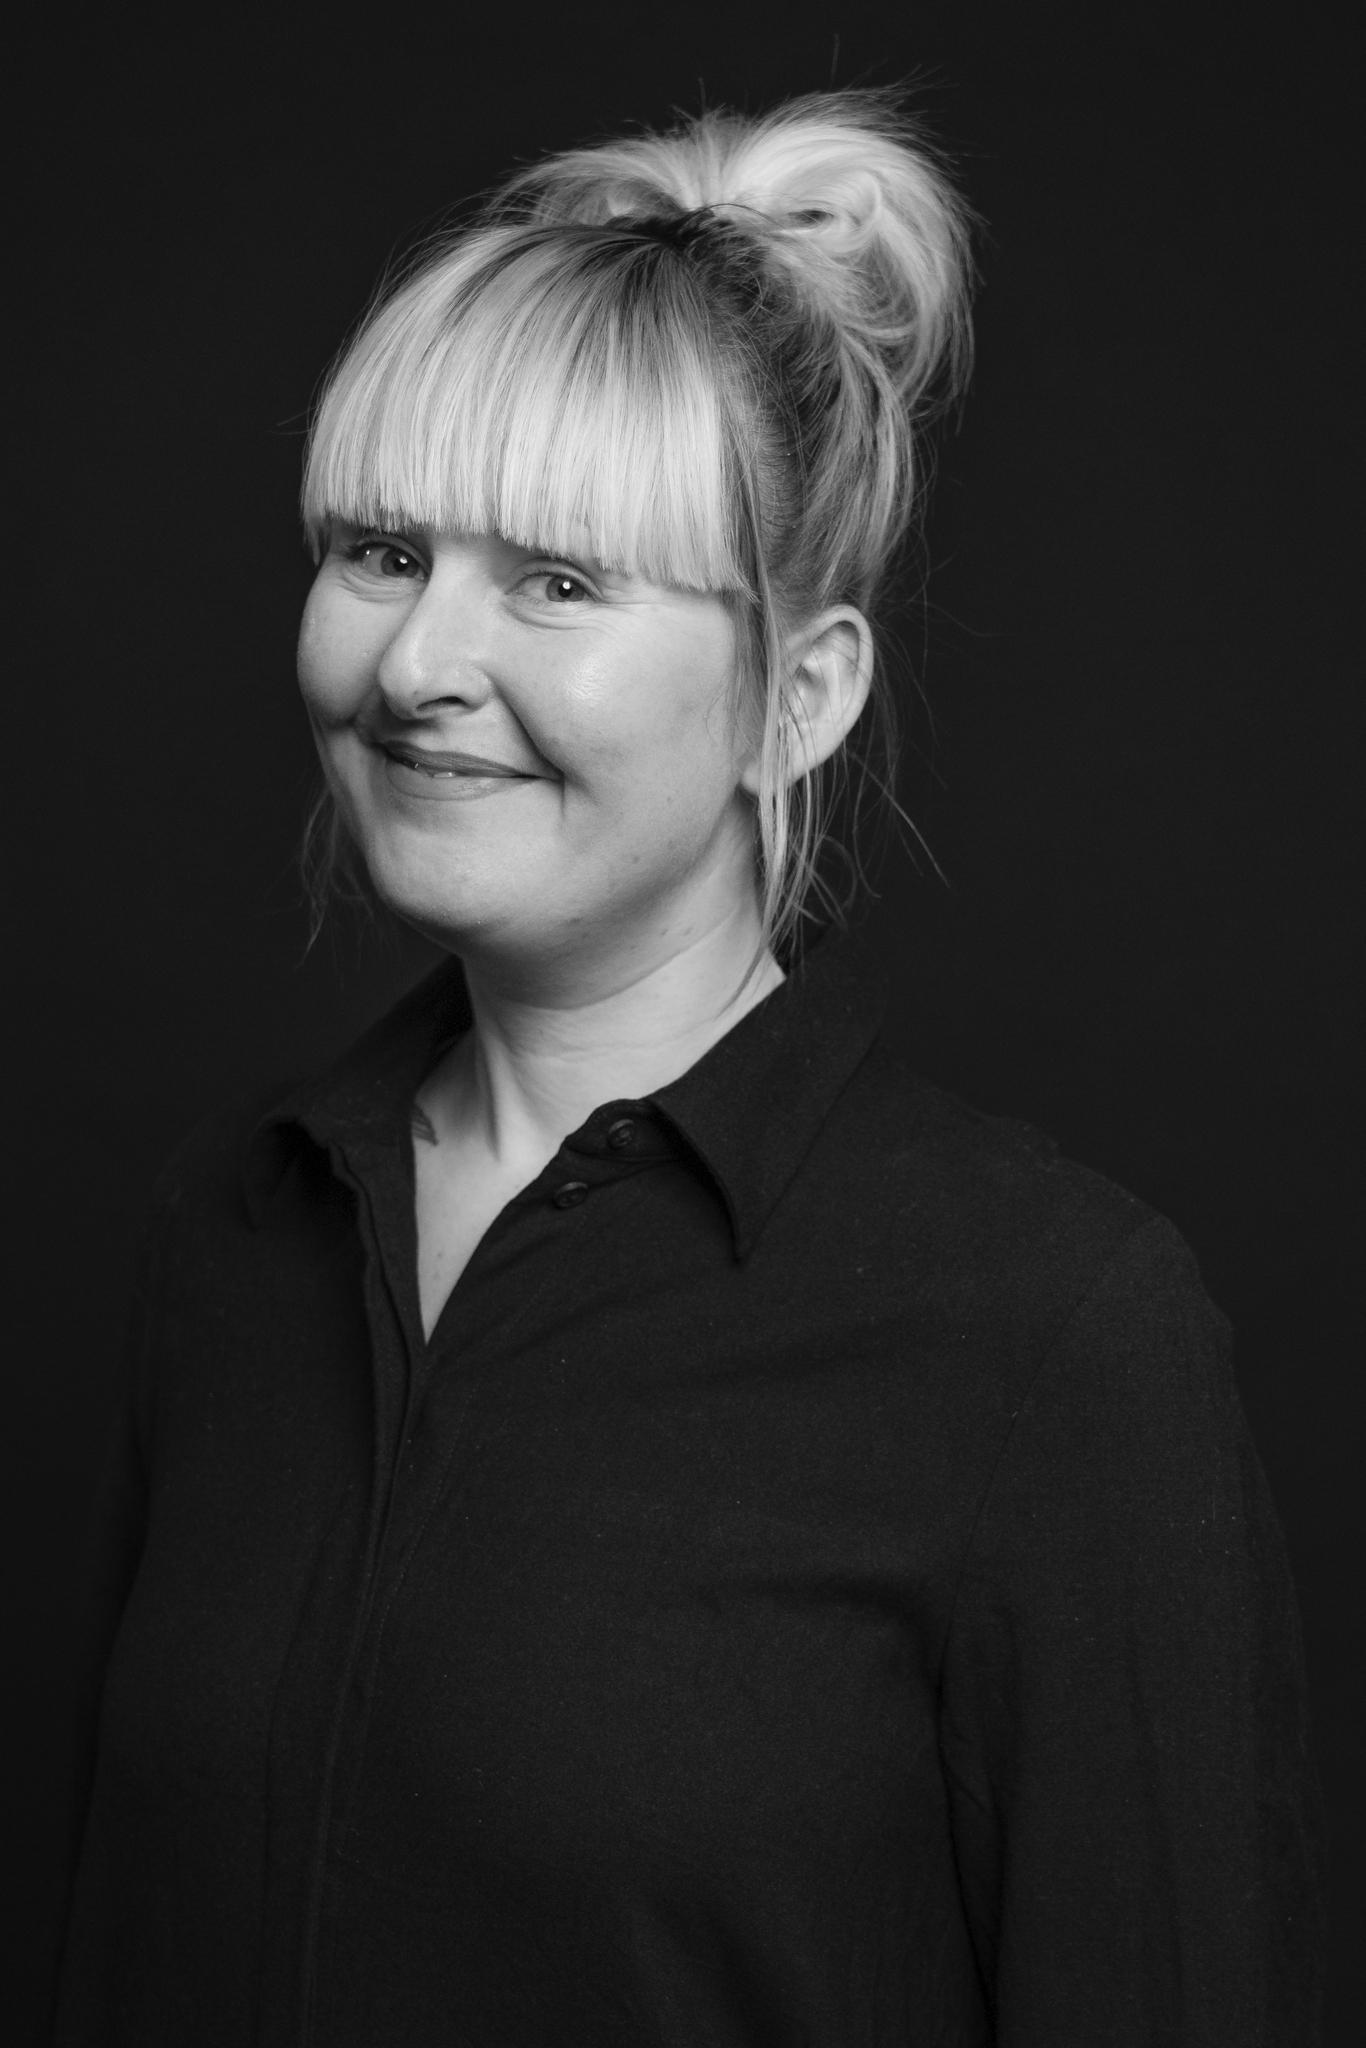 Christin Andreassen image 1